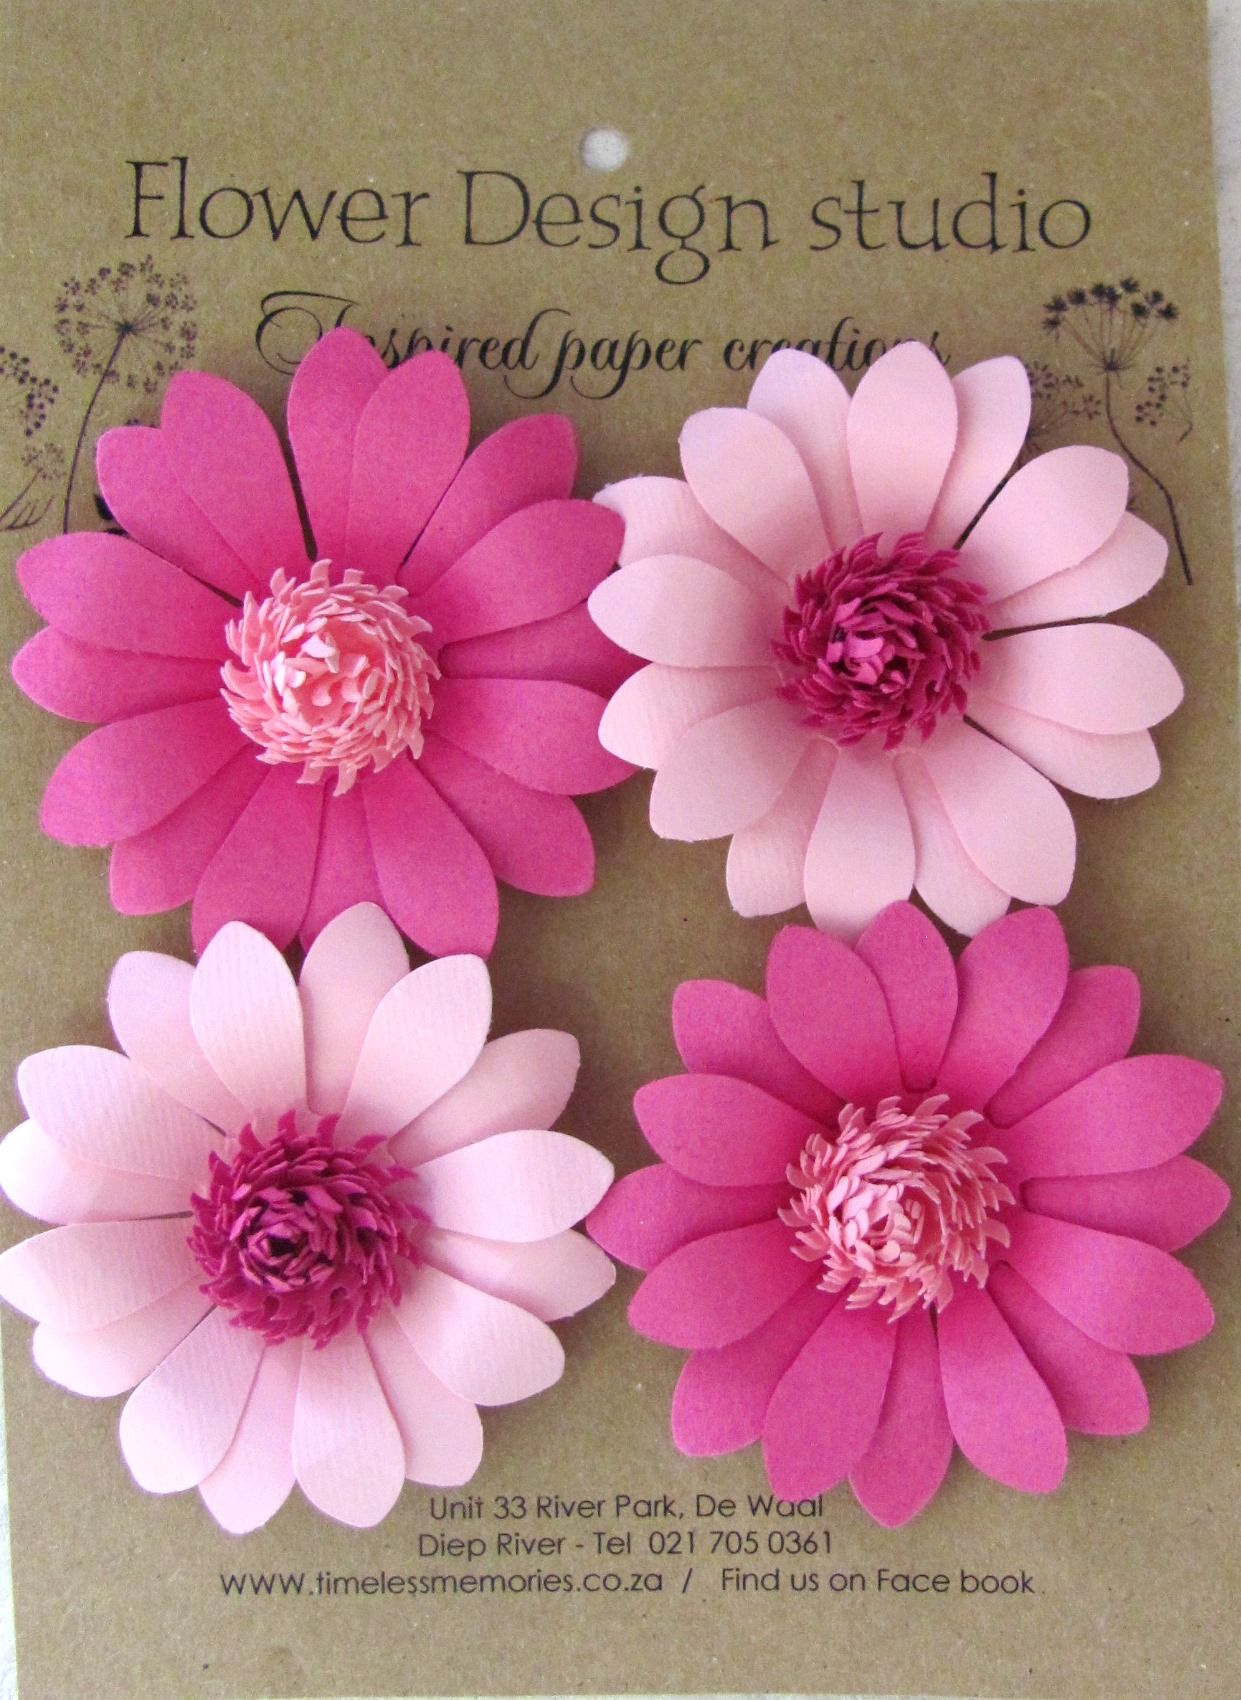 Baha daisy pink  DIY Flowers u Ribbon  Pinterest  Diy flowers